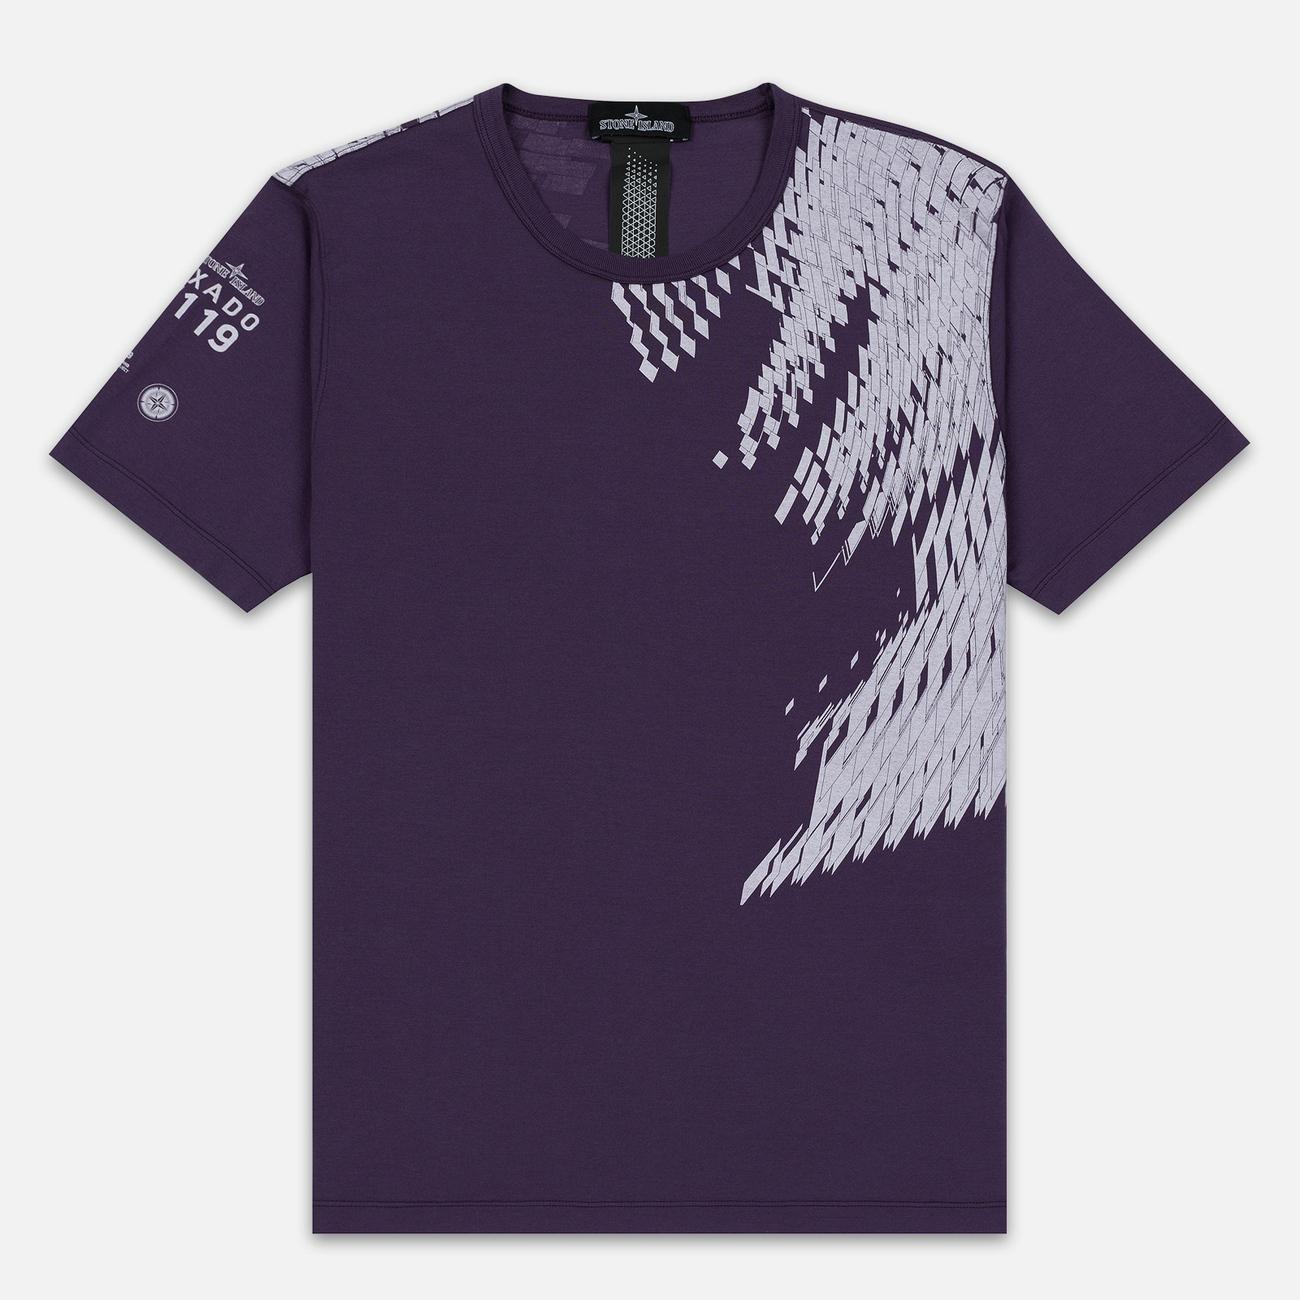 Мужская футболка Stone Island Shadow Project 7119 Print Indigo